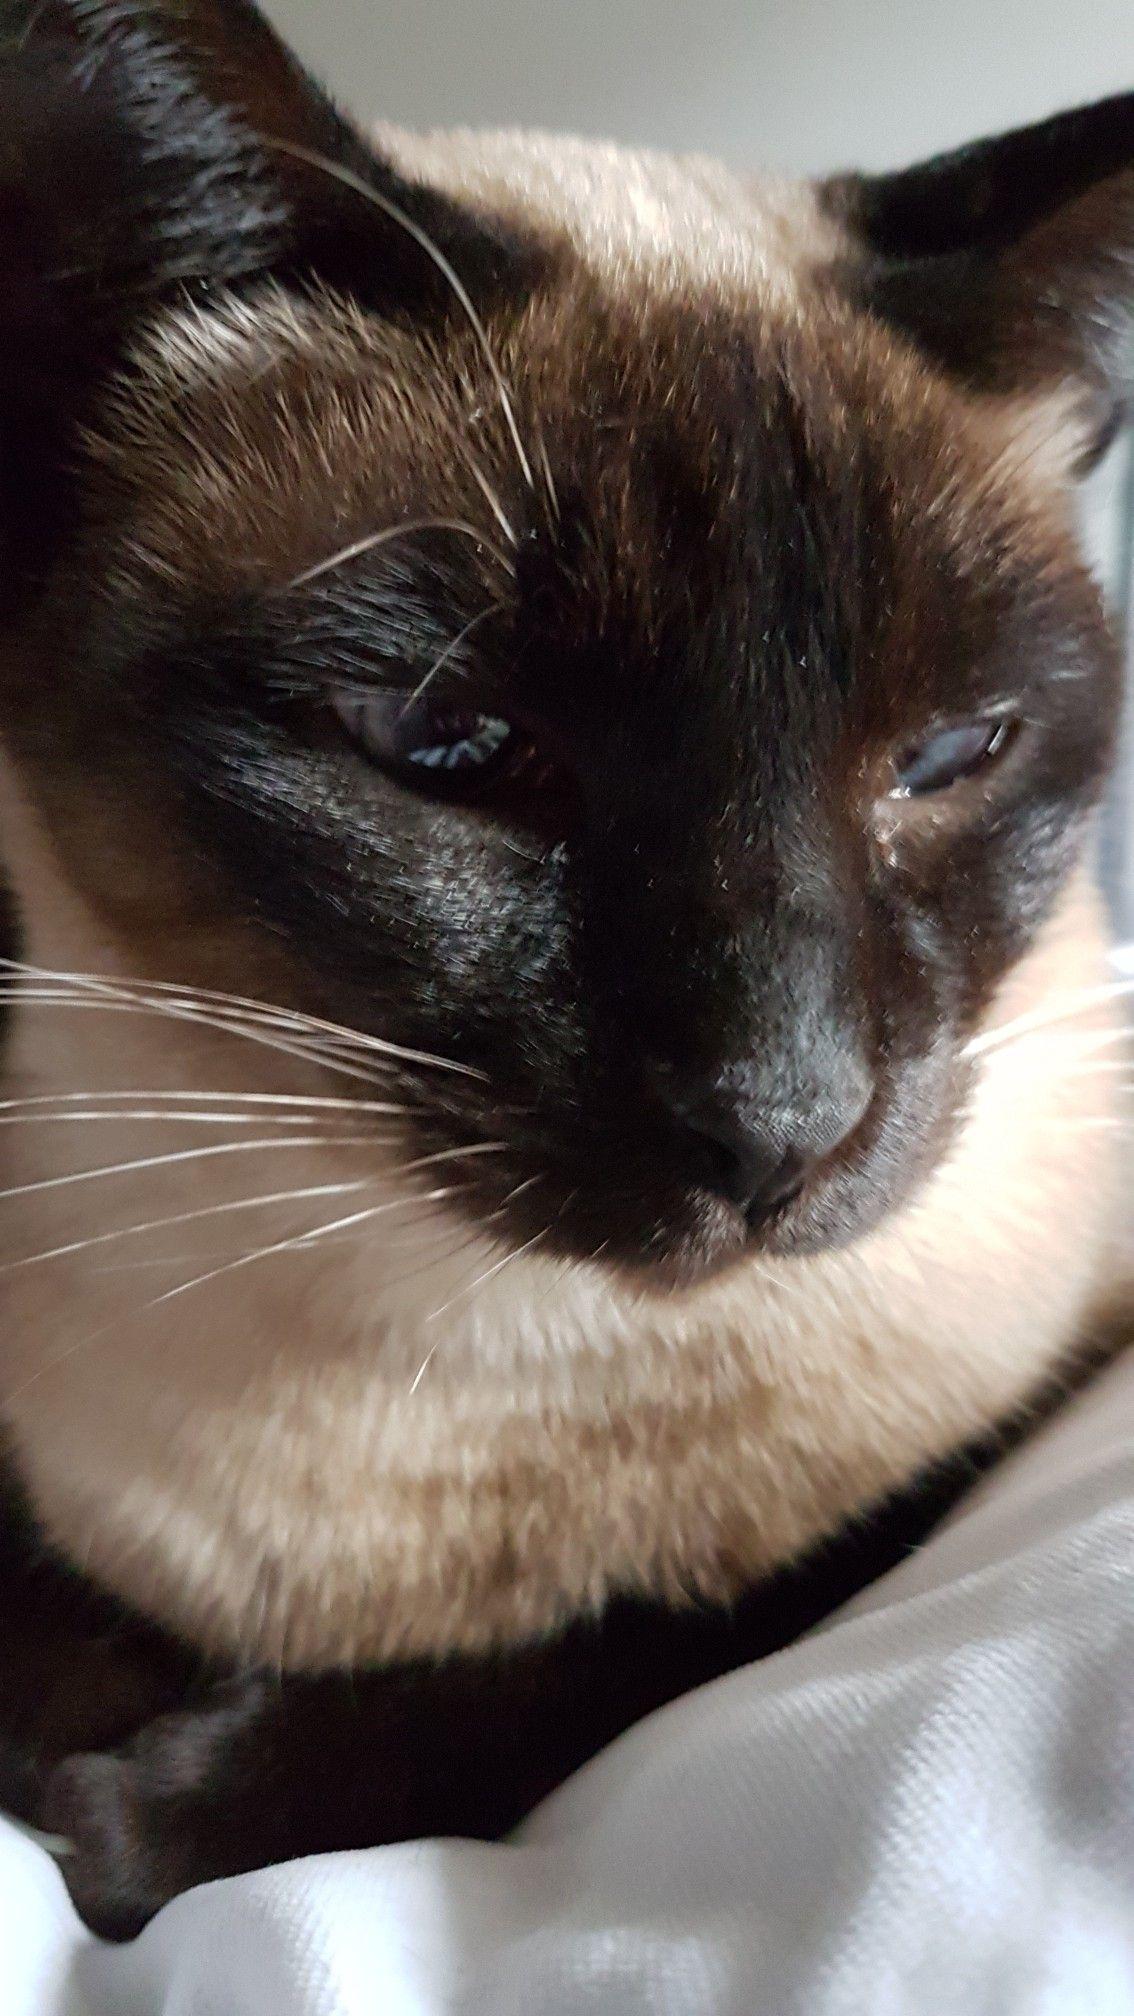 Pin by shiela hancock on Cats, cats, more cats! Cats